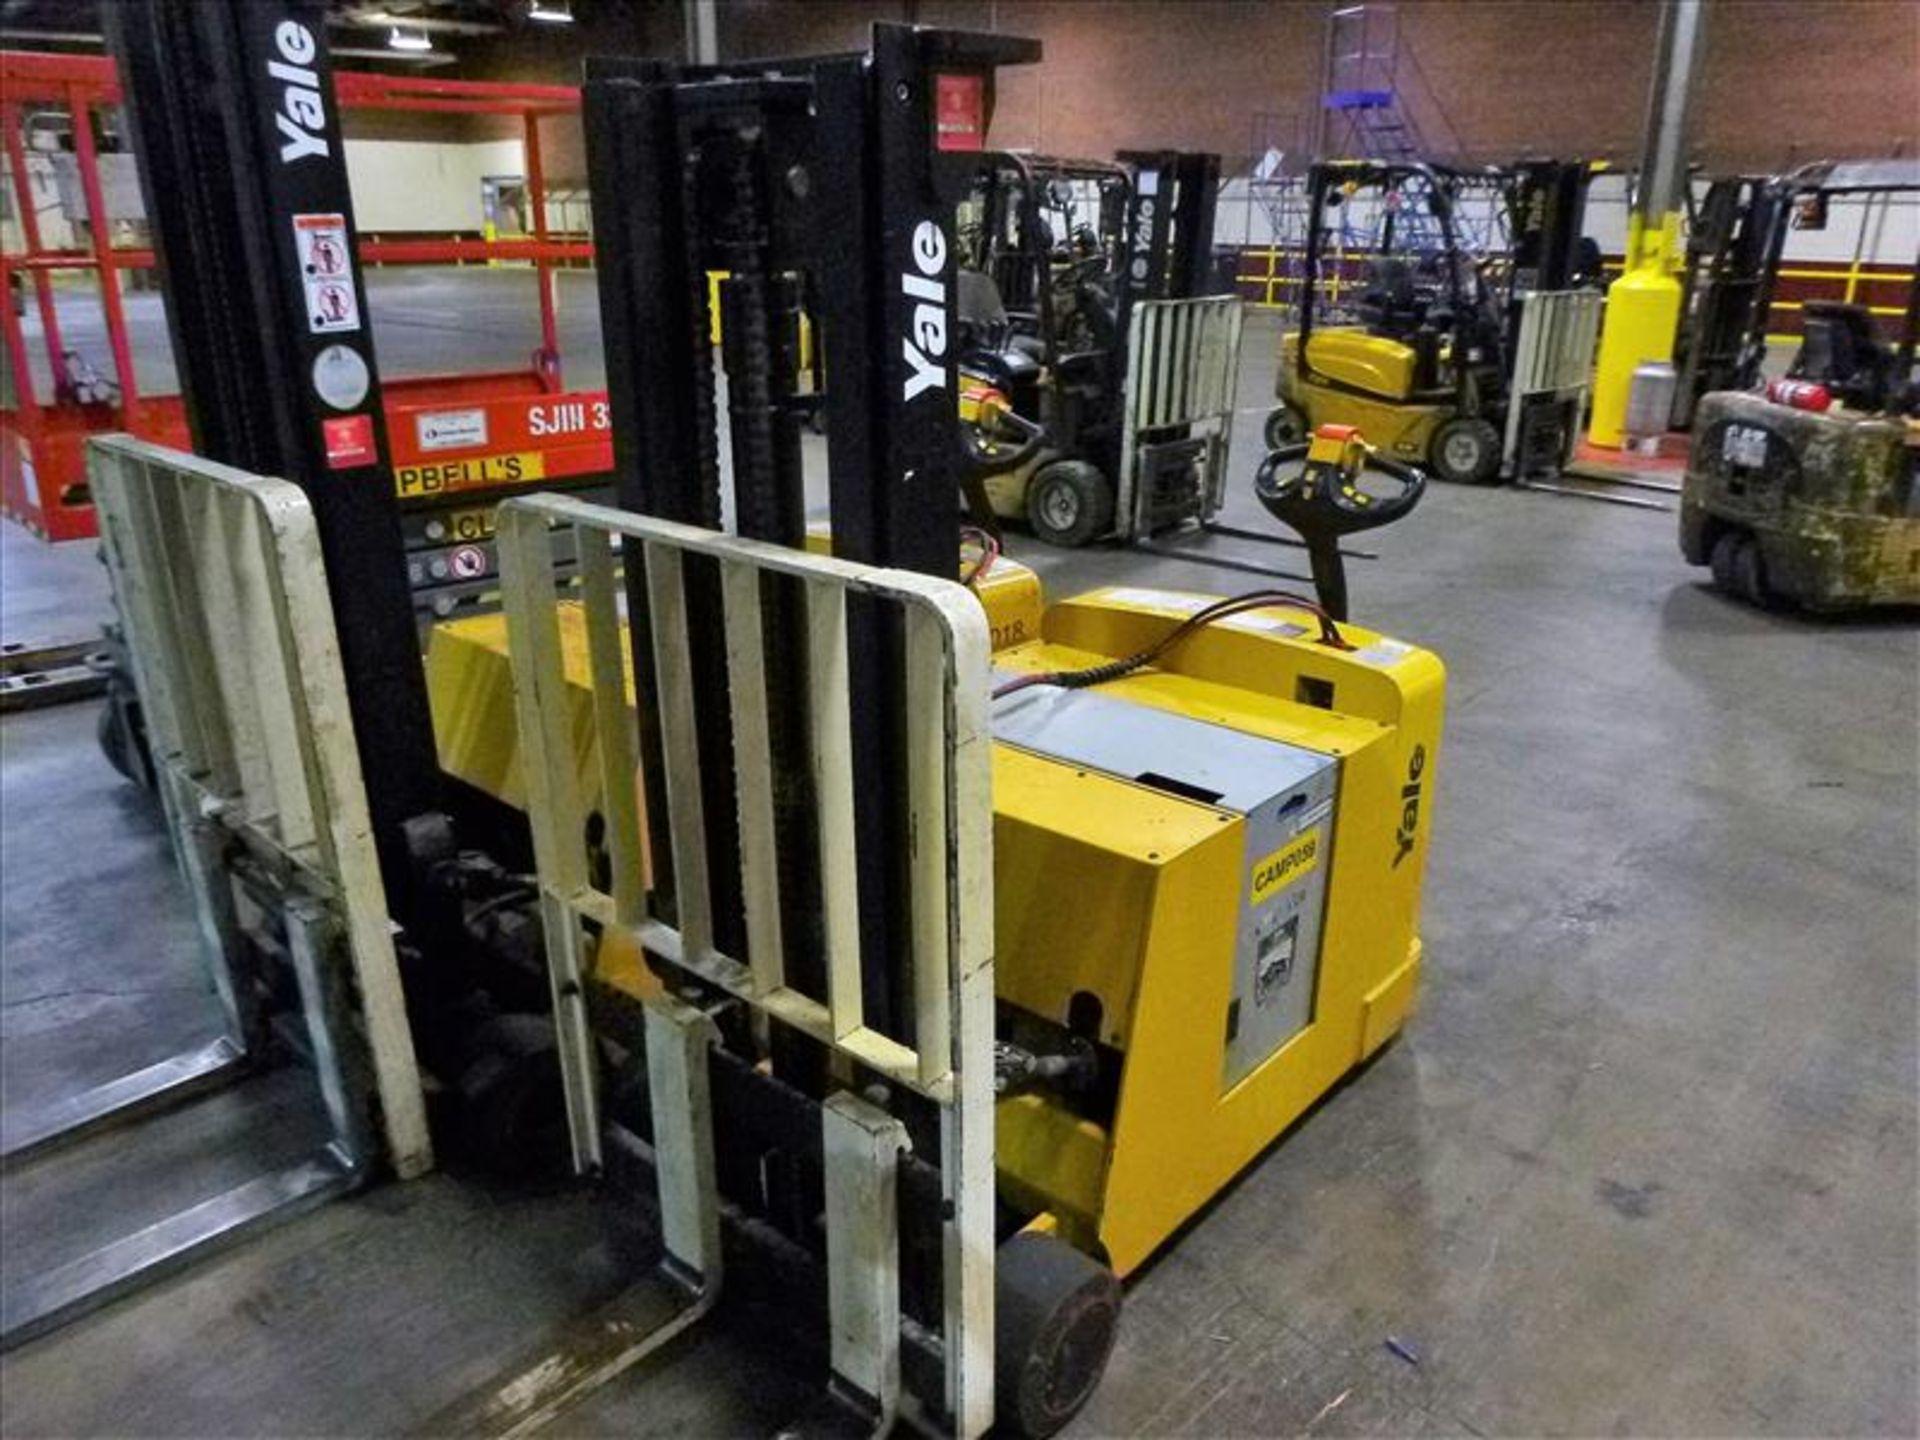 Lot 2023 - Yale walk-behind fork lift truck, mod. MCW030LEN24TV072, ser. no. C819N02806N, 24V electric, 3000